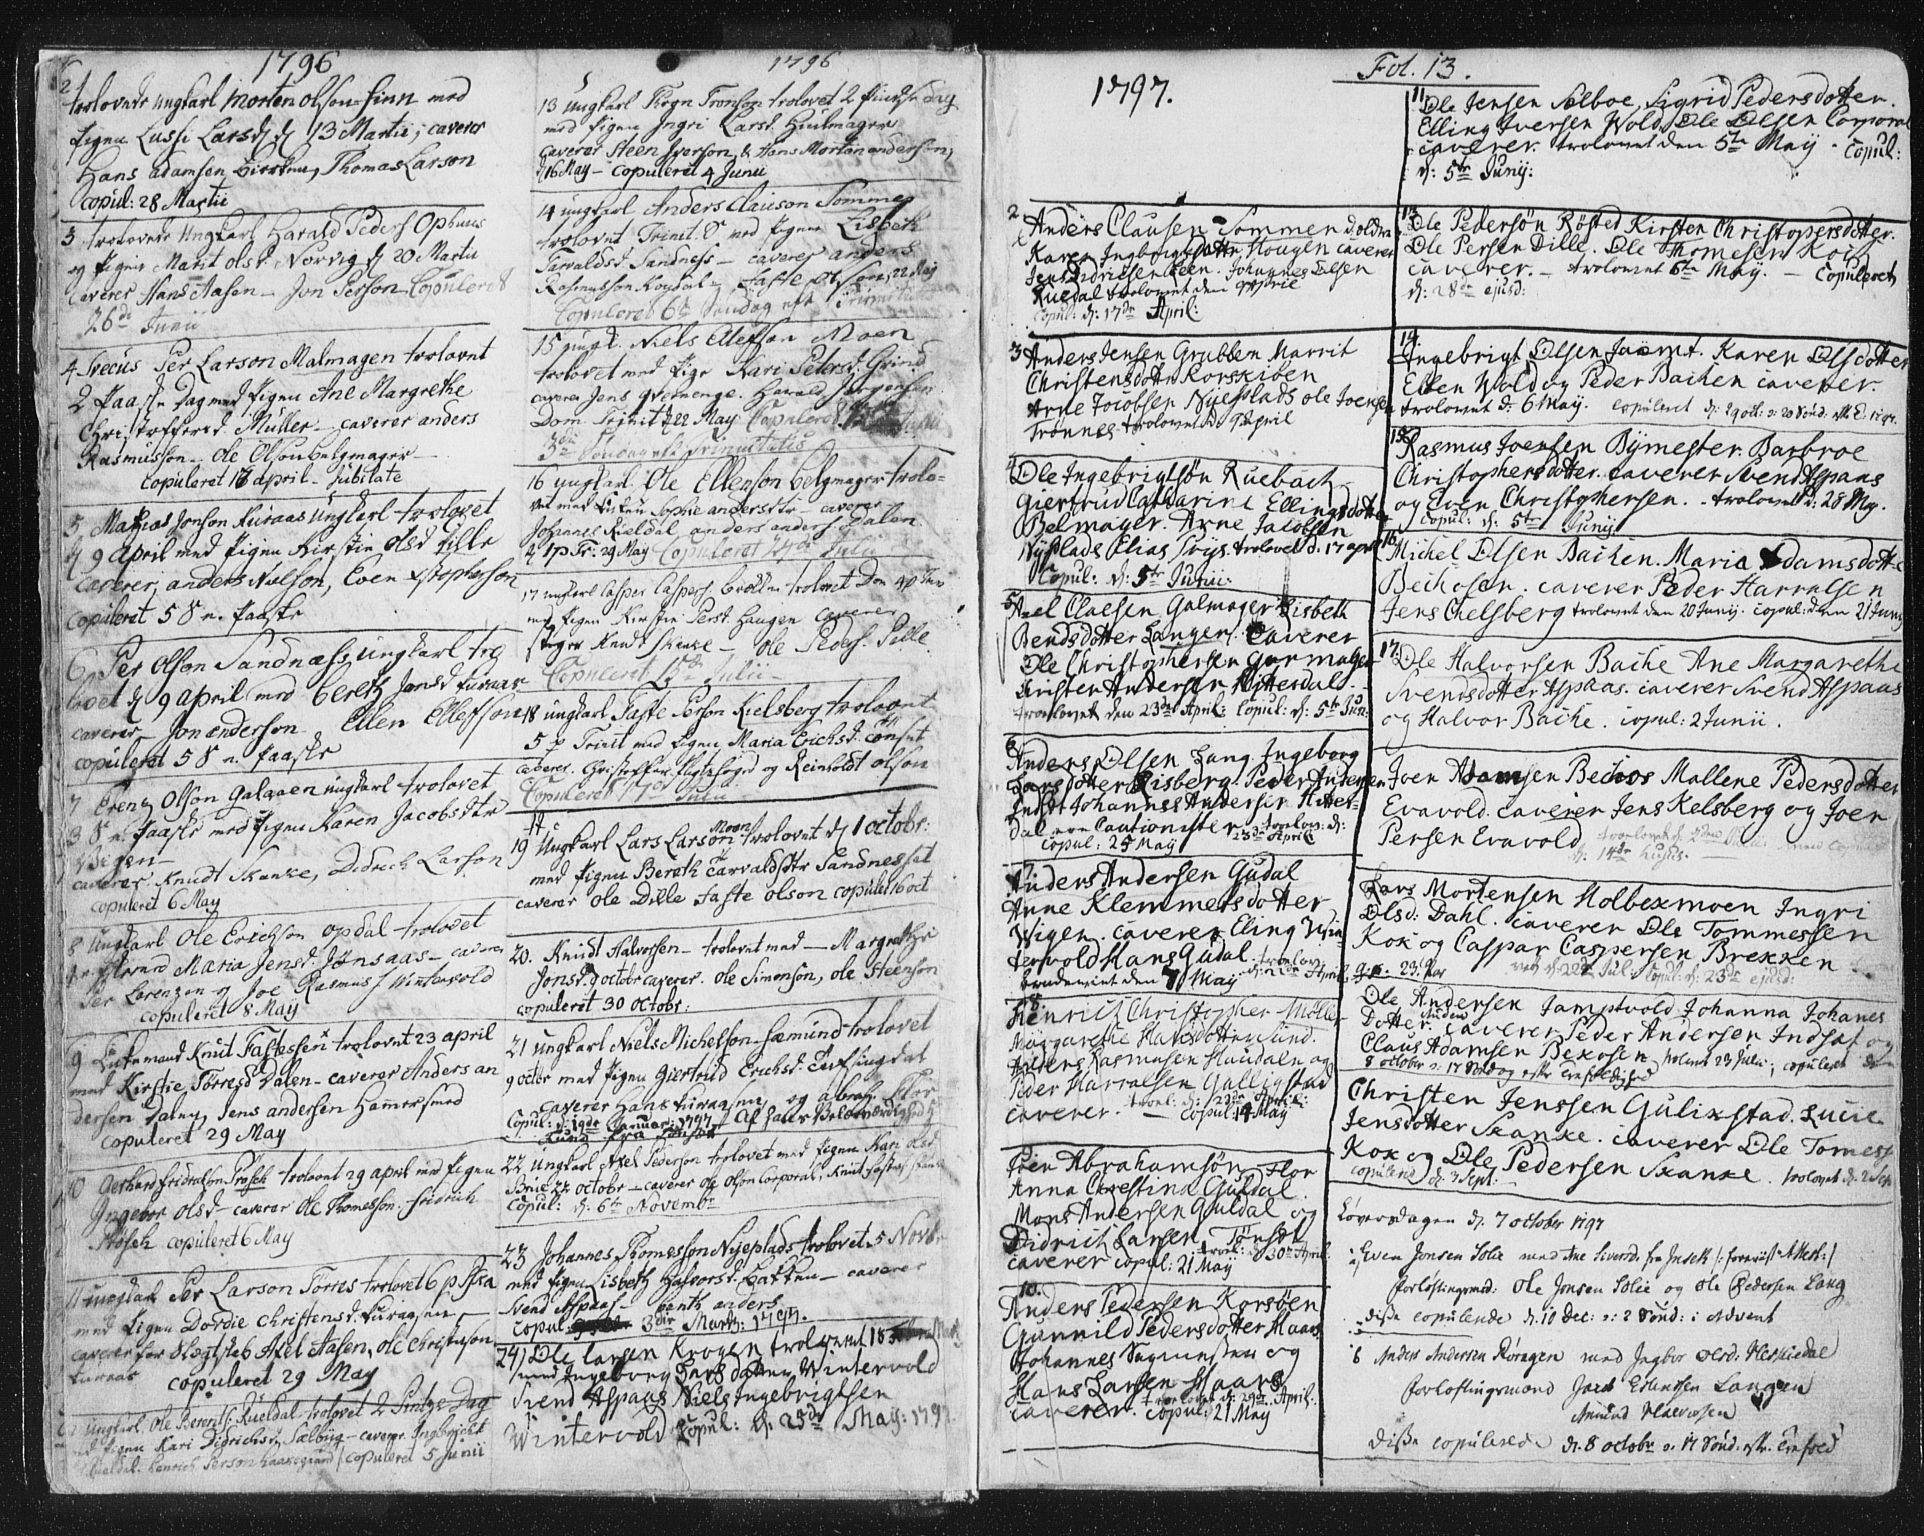 SAT, Ministerialprotokoller, klokkerbøker og fødselsregistre - Sør-Trøndelag, 681/L0926: Parish register (official) no. 681A04, 1767-1797, p. 13